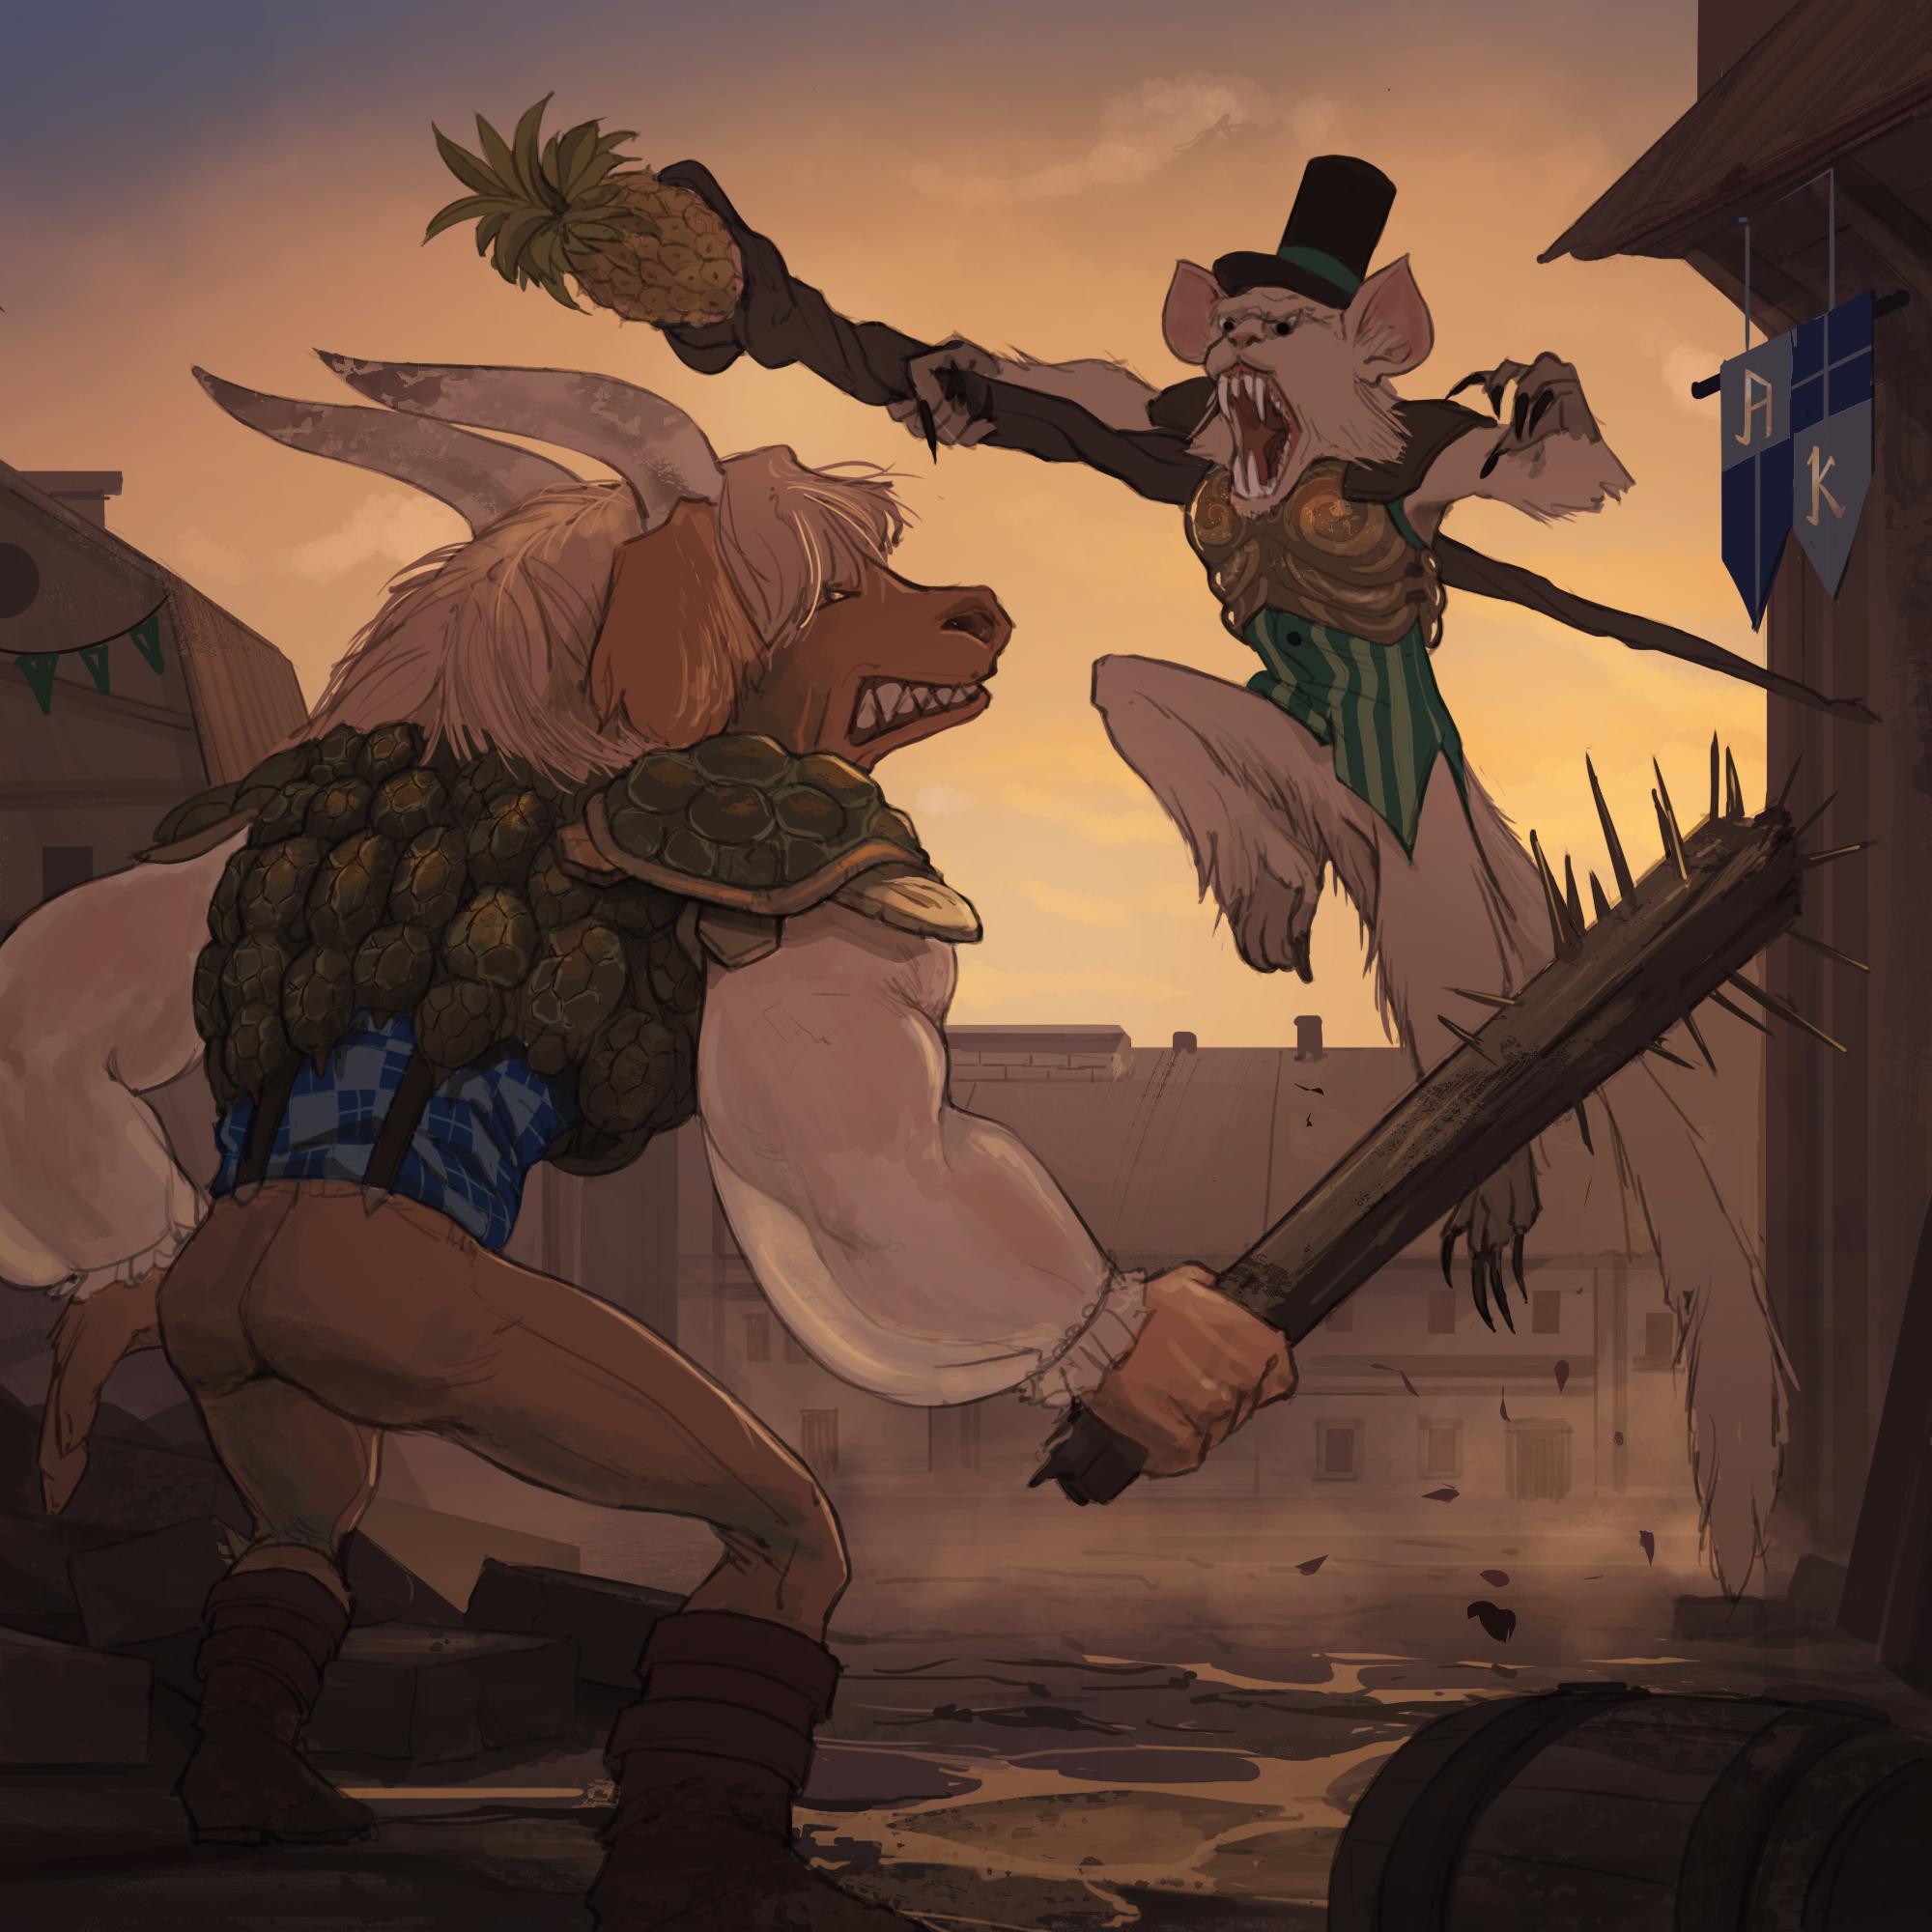 Brawl: Mouflon vs. Macaquiño